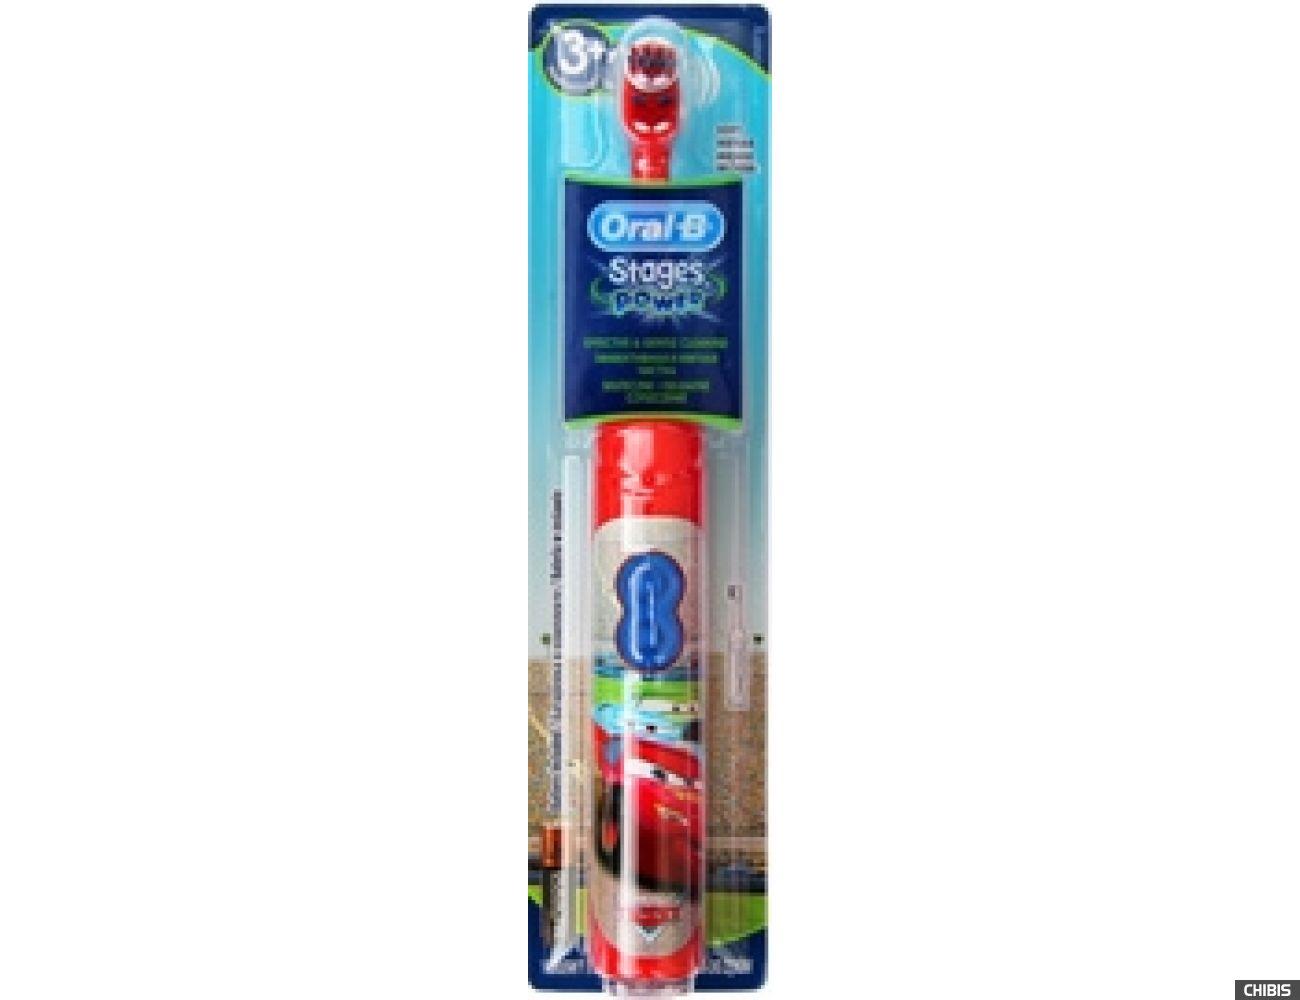 Электрическая зубная щетка Oral B Braun Stages Power машинки (DB3010)